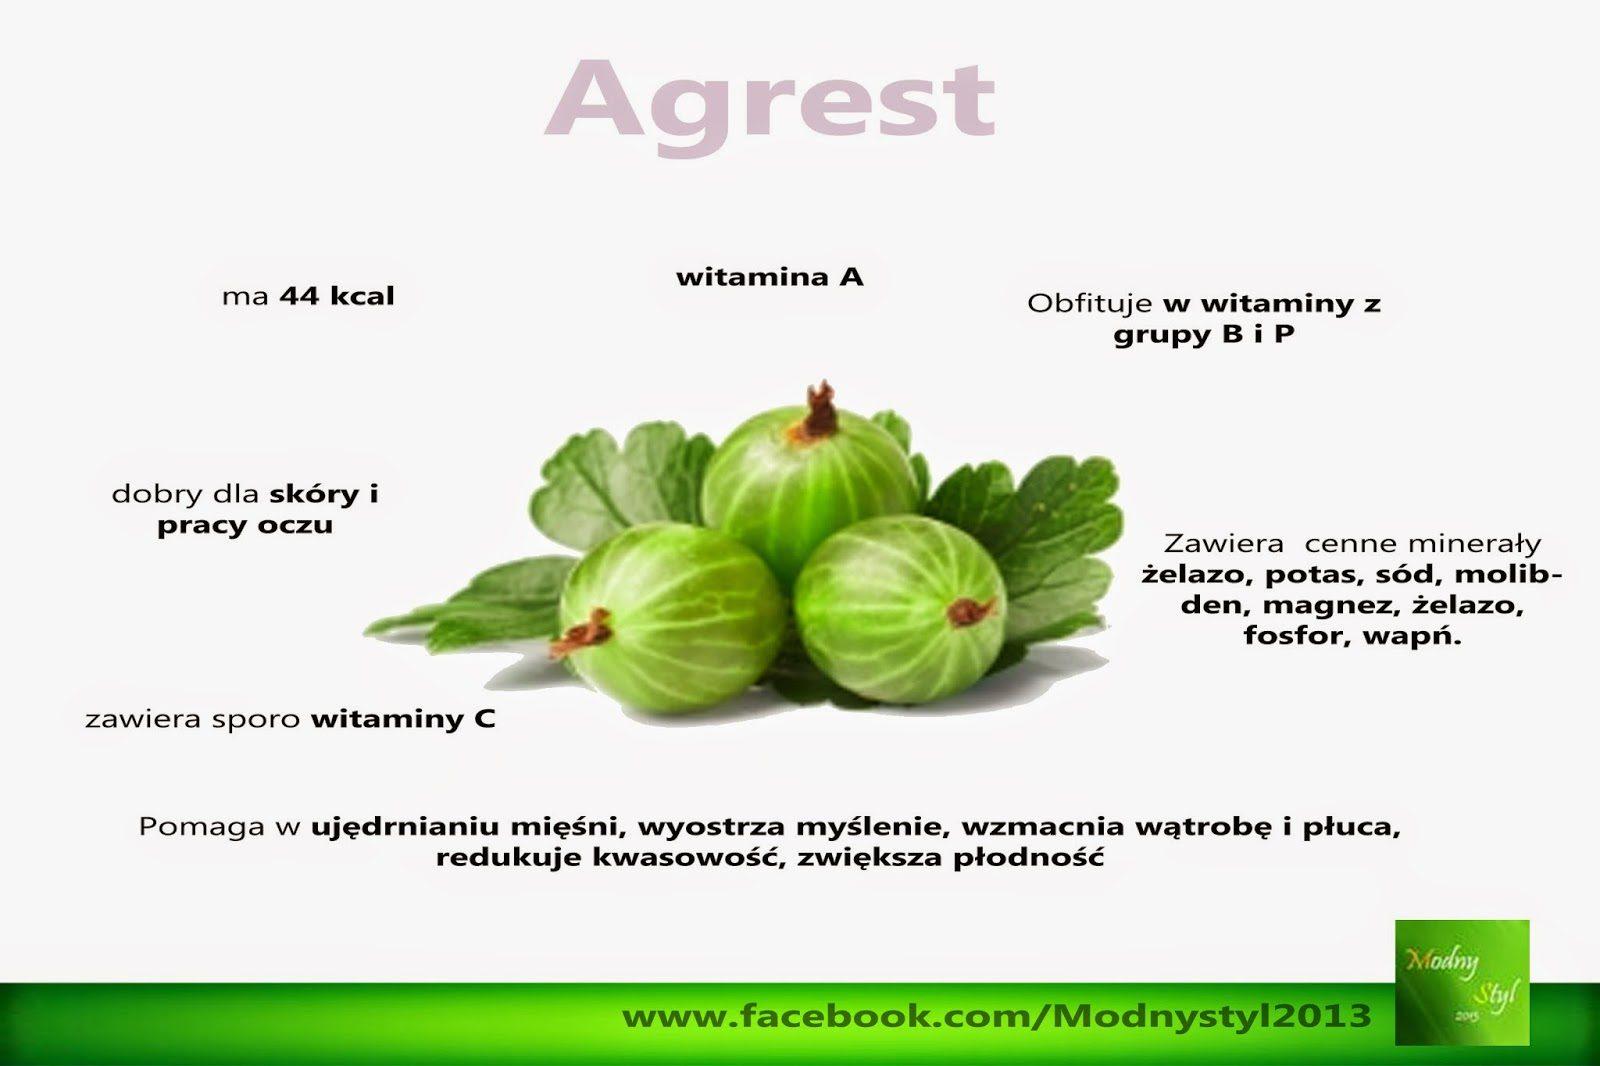 agrest-5361108